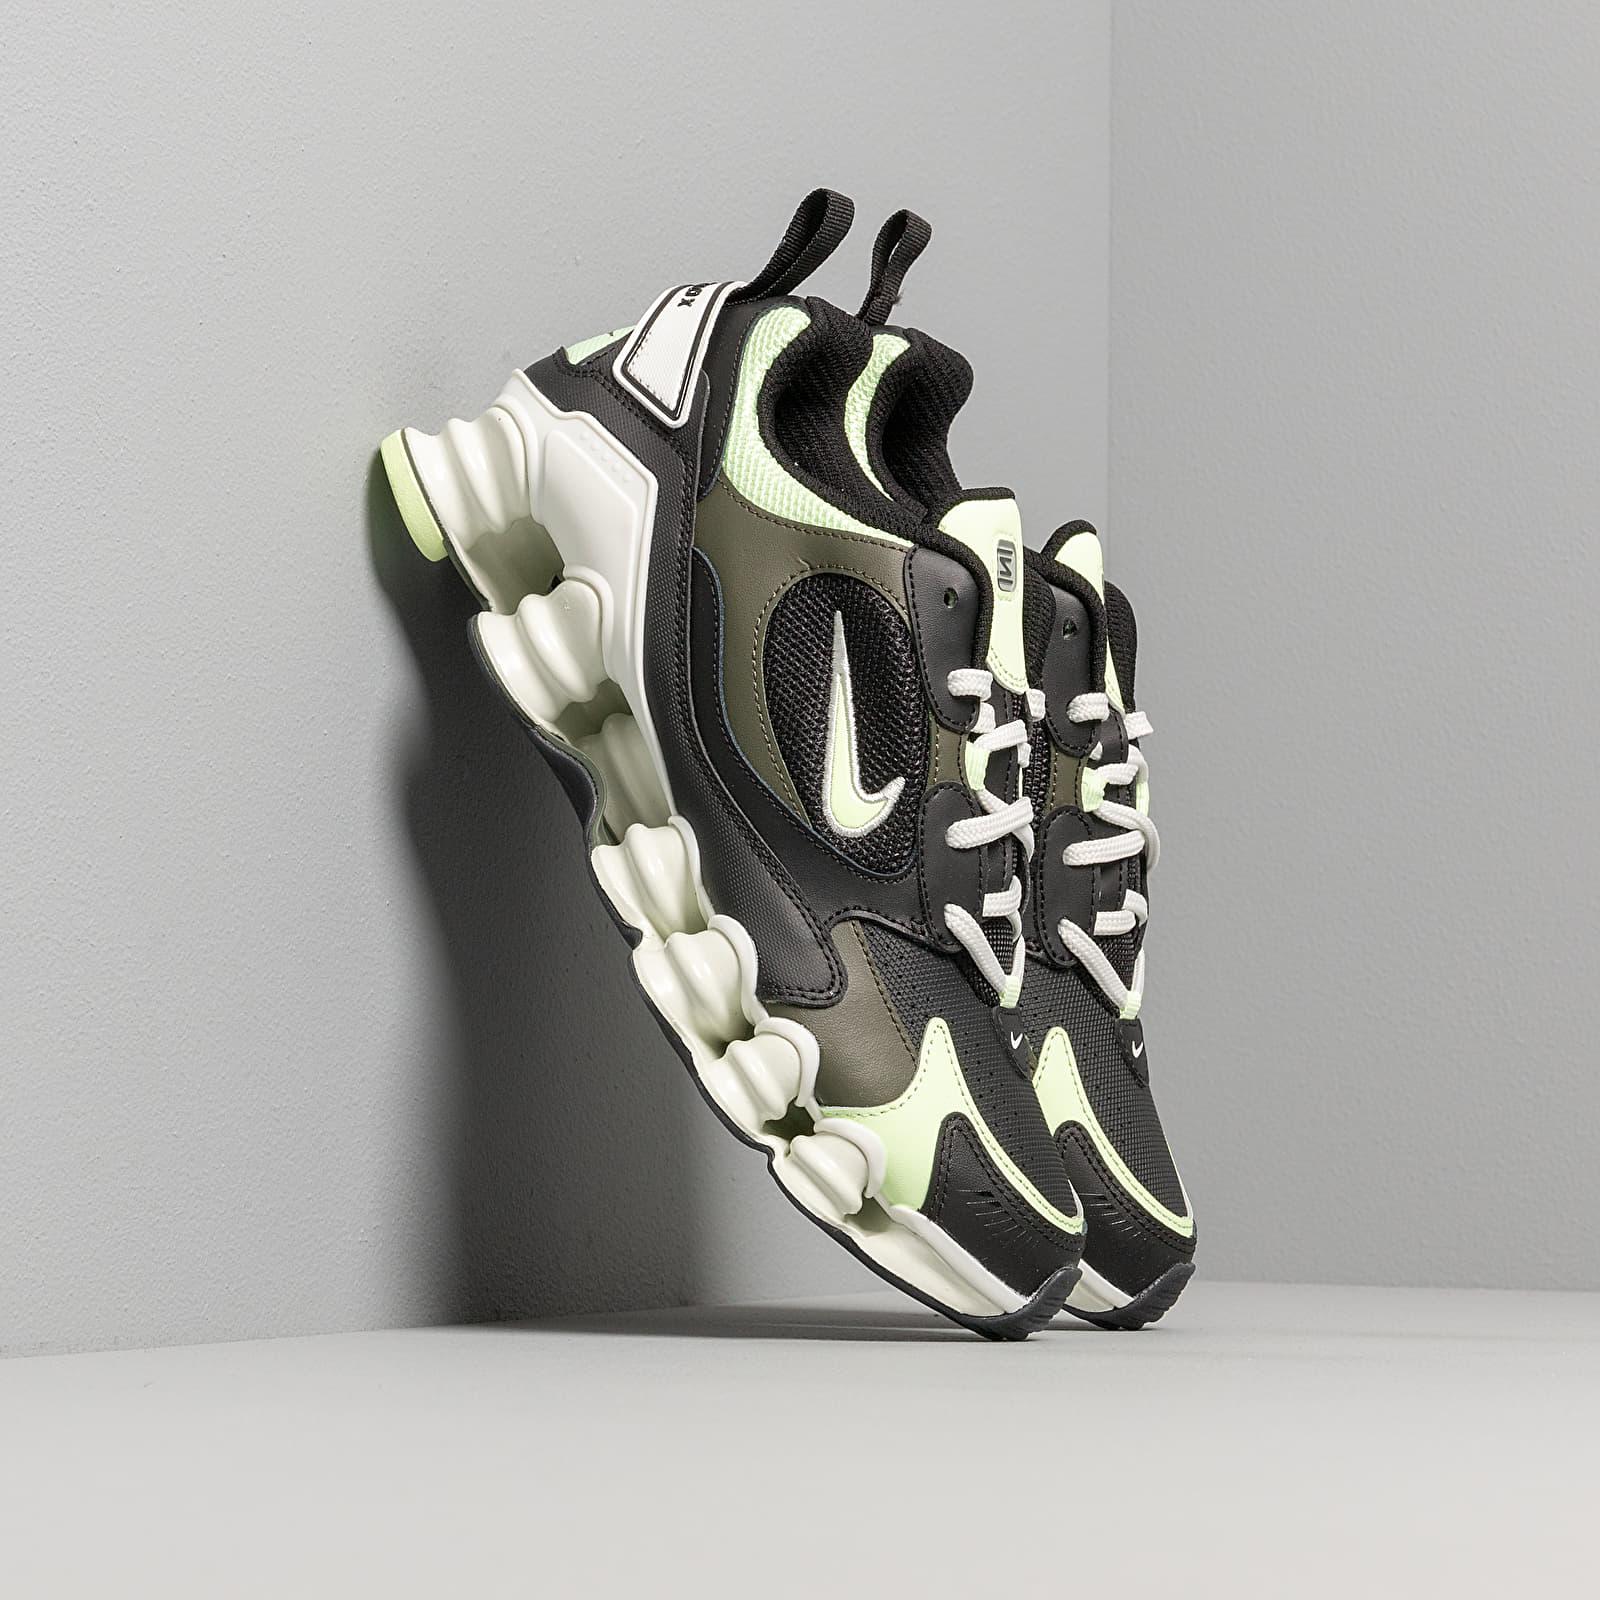 Chaussures et baskets femme Nike W Shox TL Nova Black/ Barely Volt-Cargo Khaki